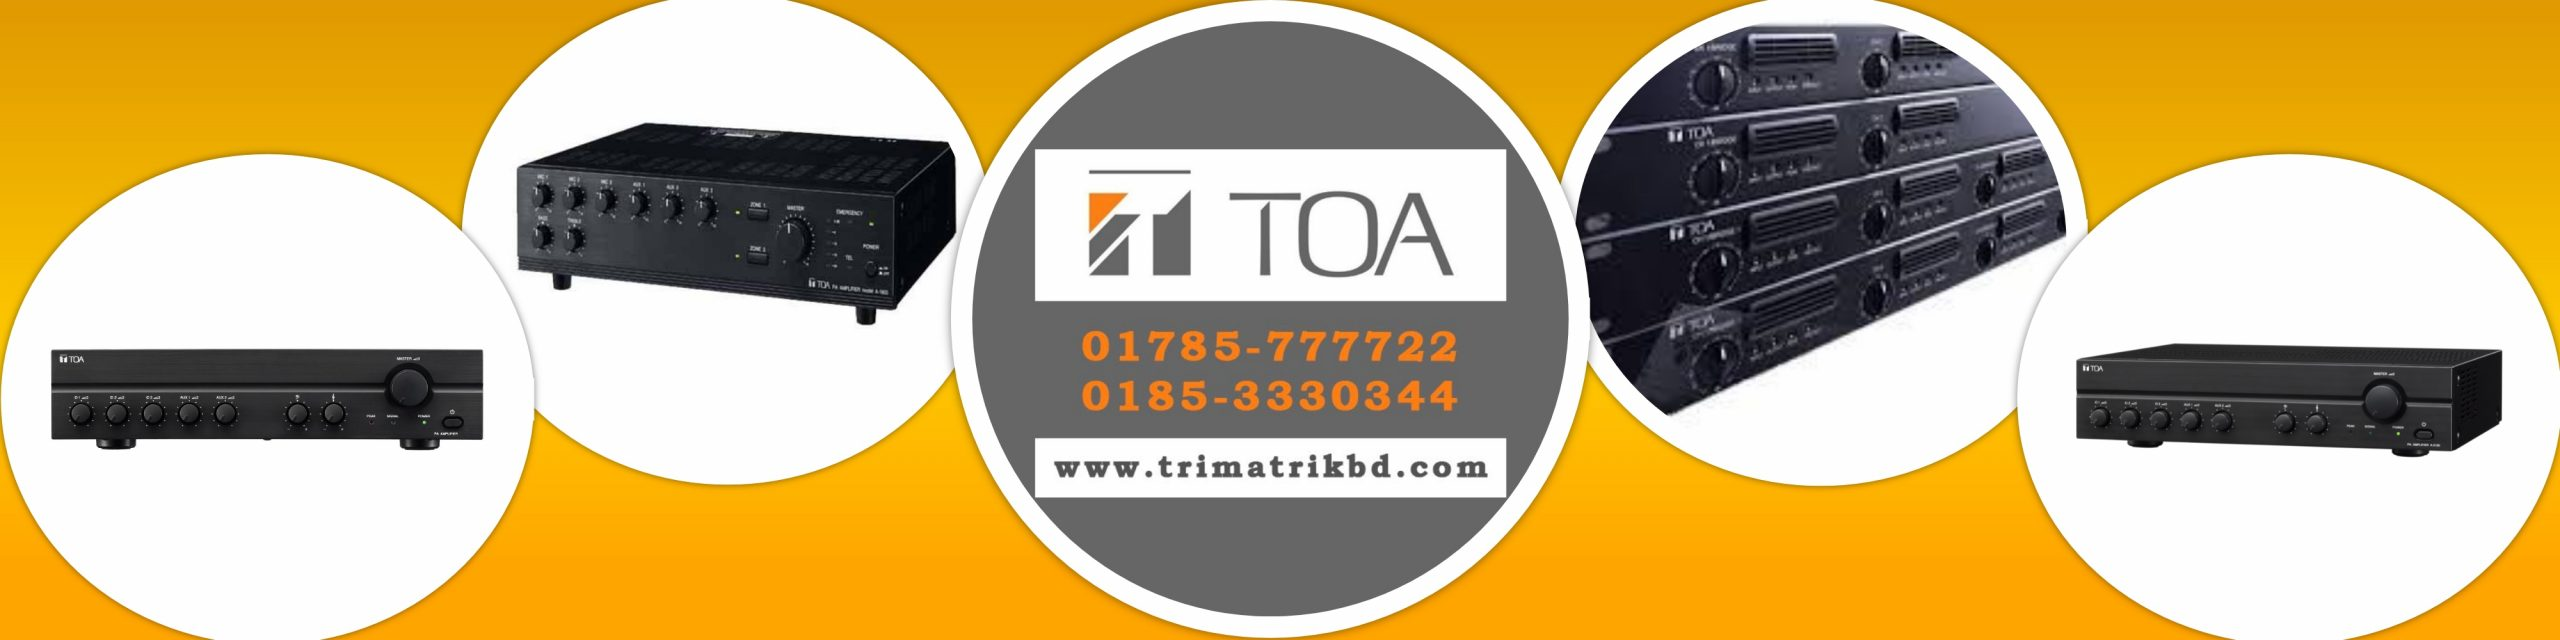 TOA Amplifier Price in Bangladesh